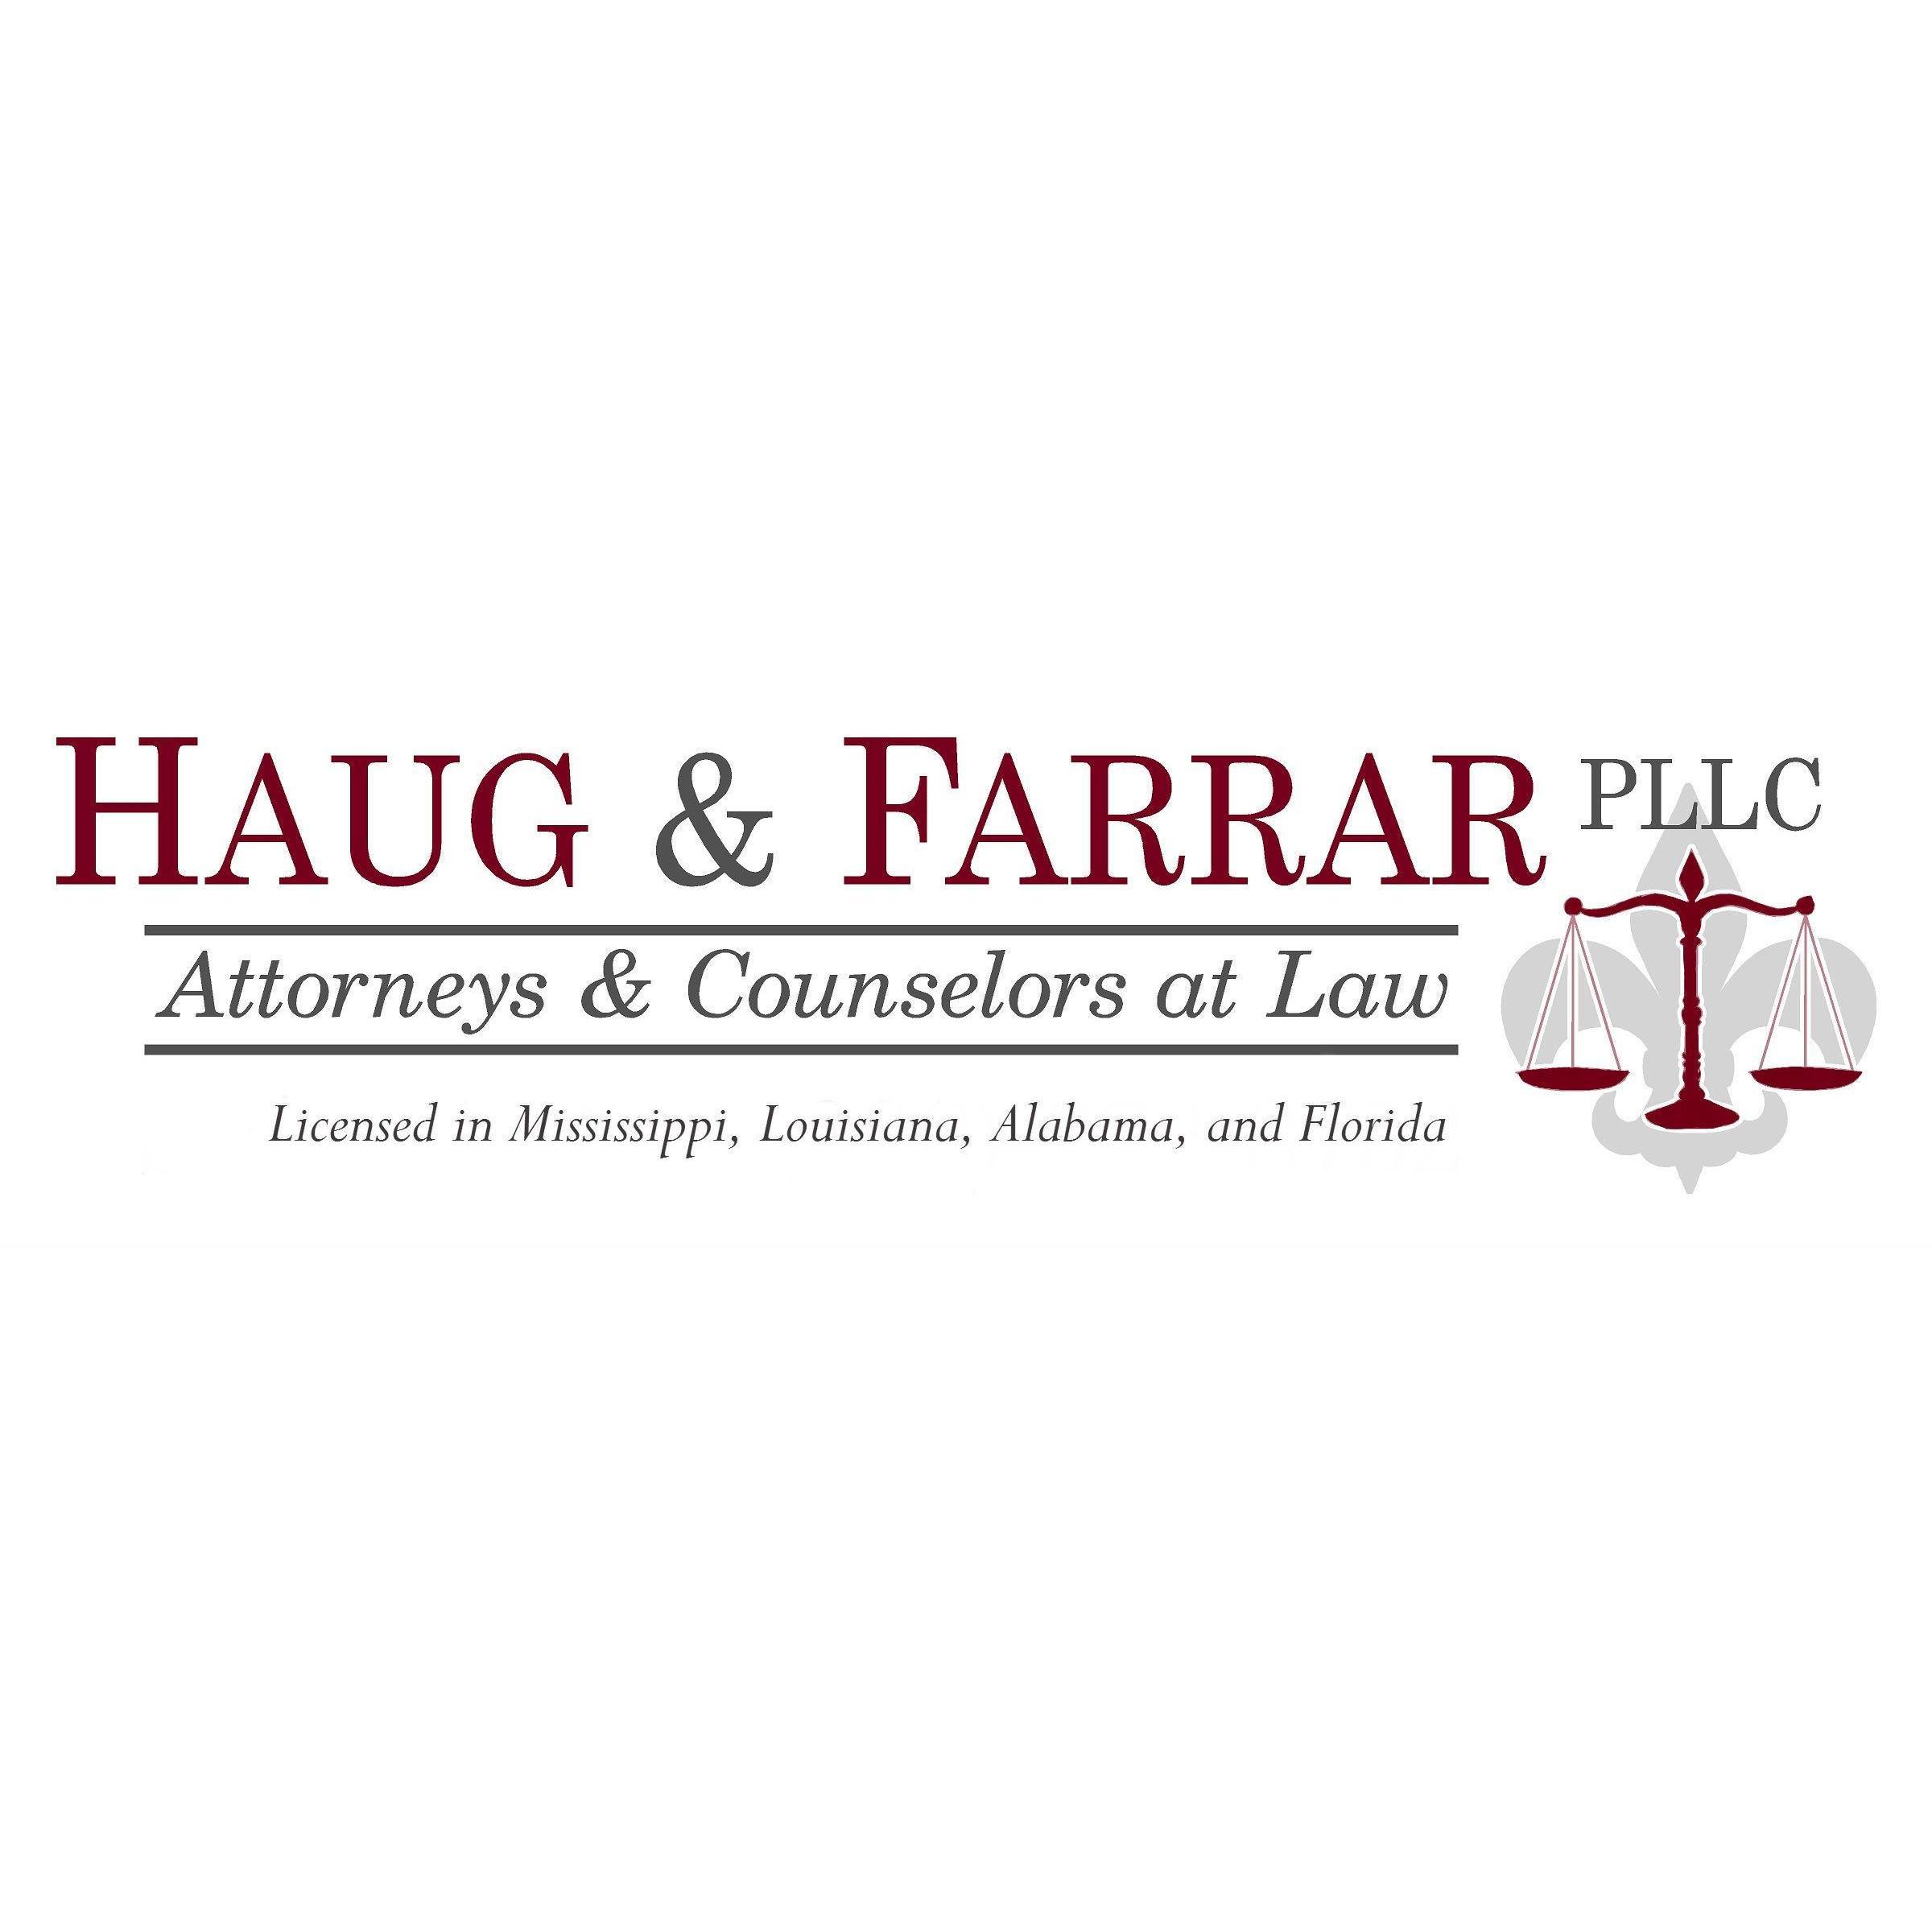 Haug & Farrar